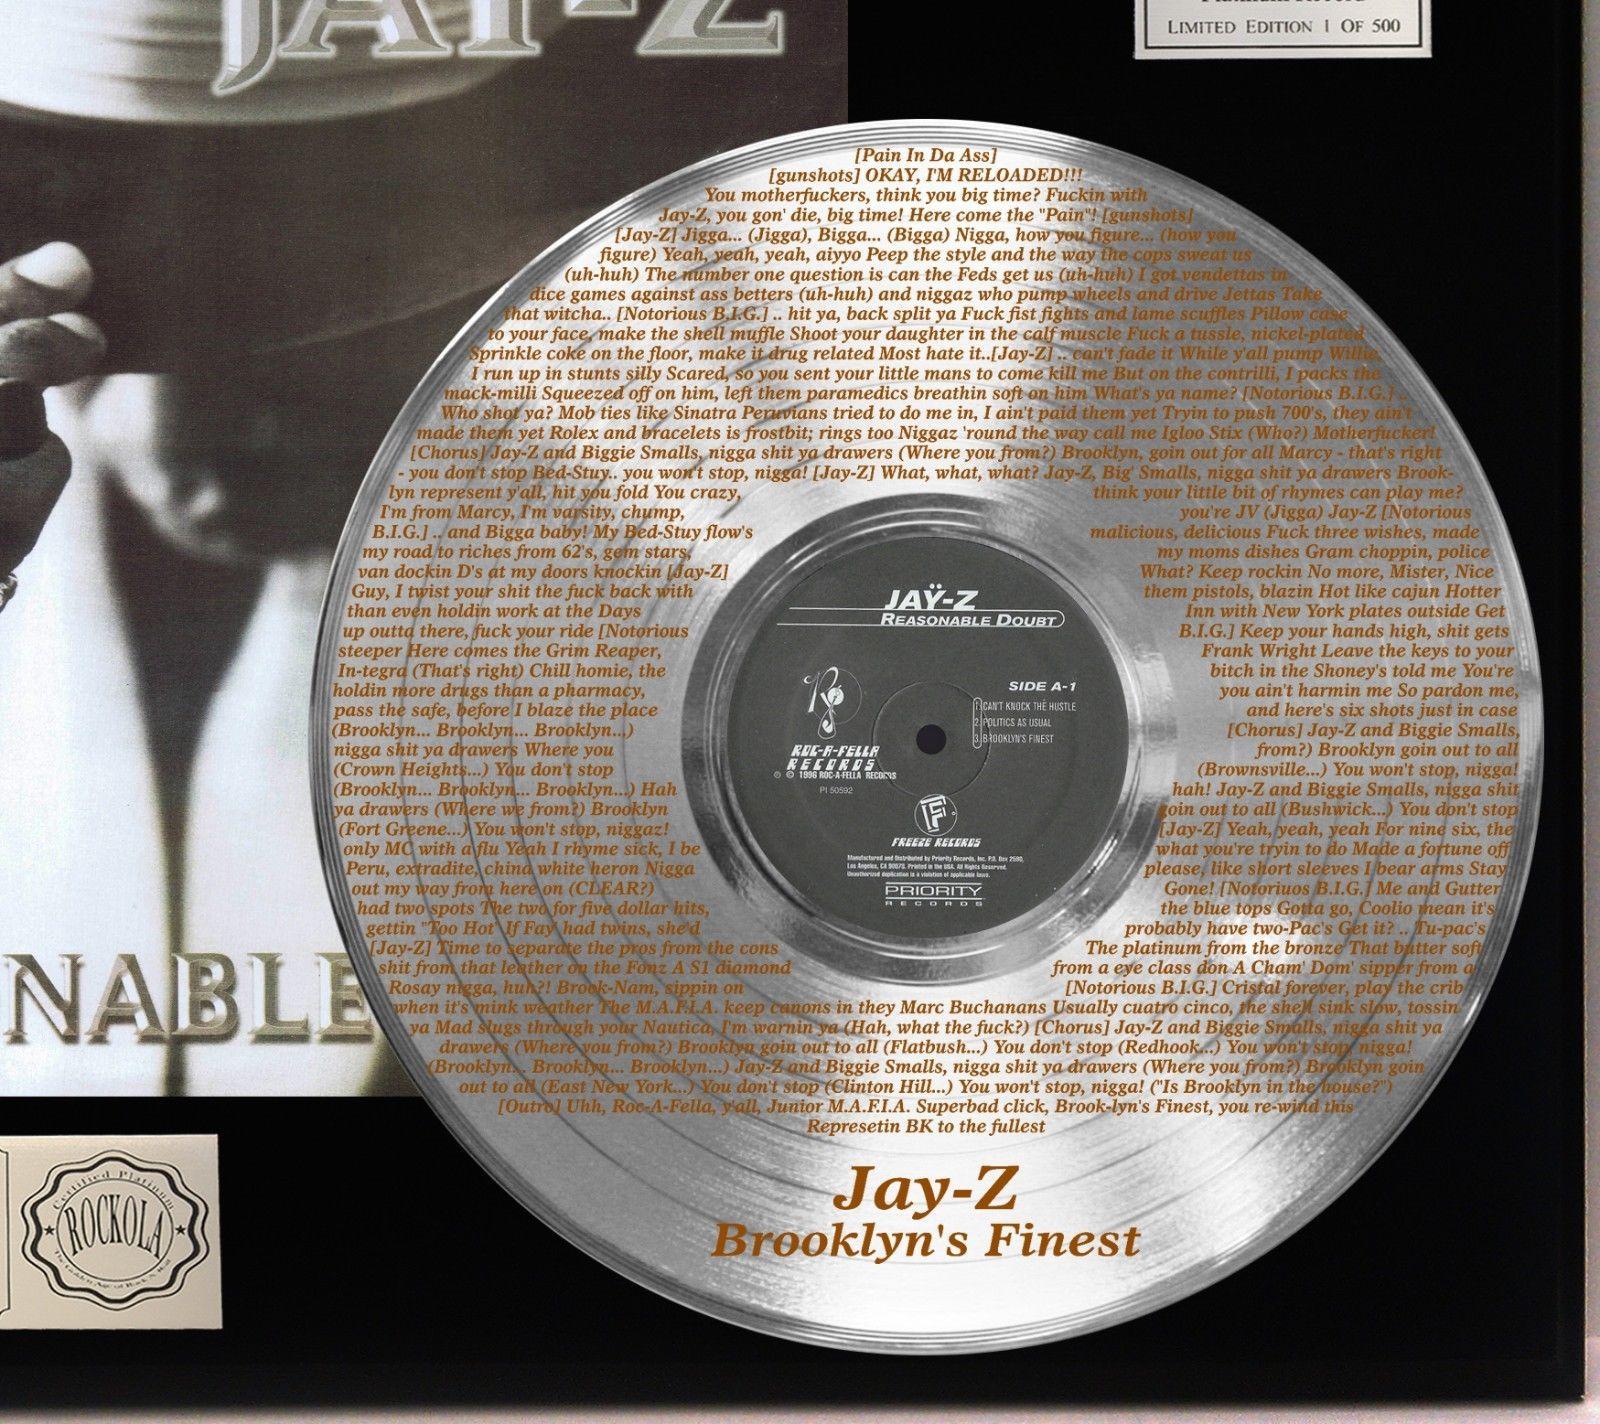 JAY Z PLATINUM LP RECORD DISPLAY ETCHED W LYRICS TO BROOKLYN'S FINEST